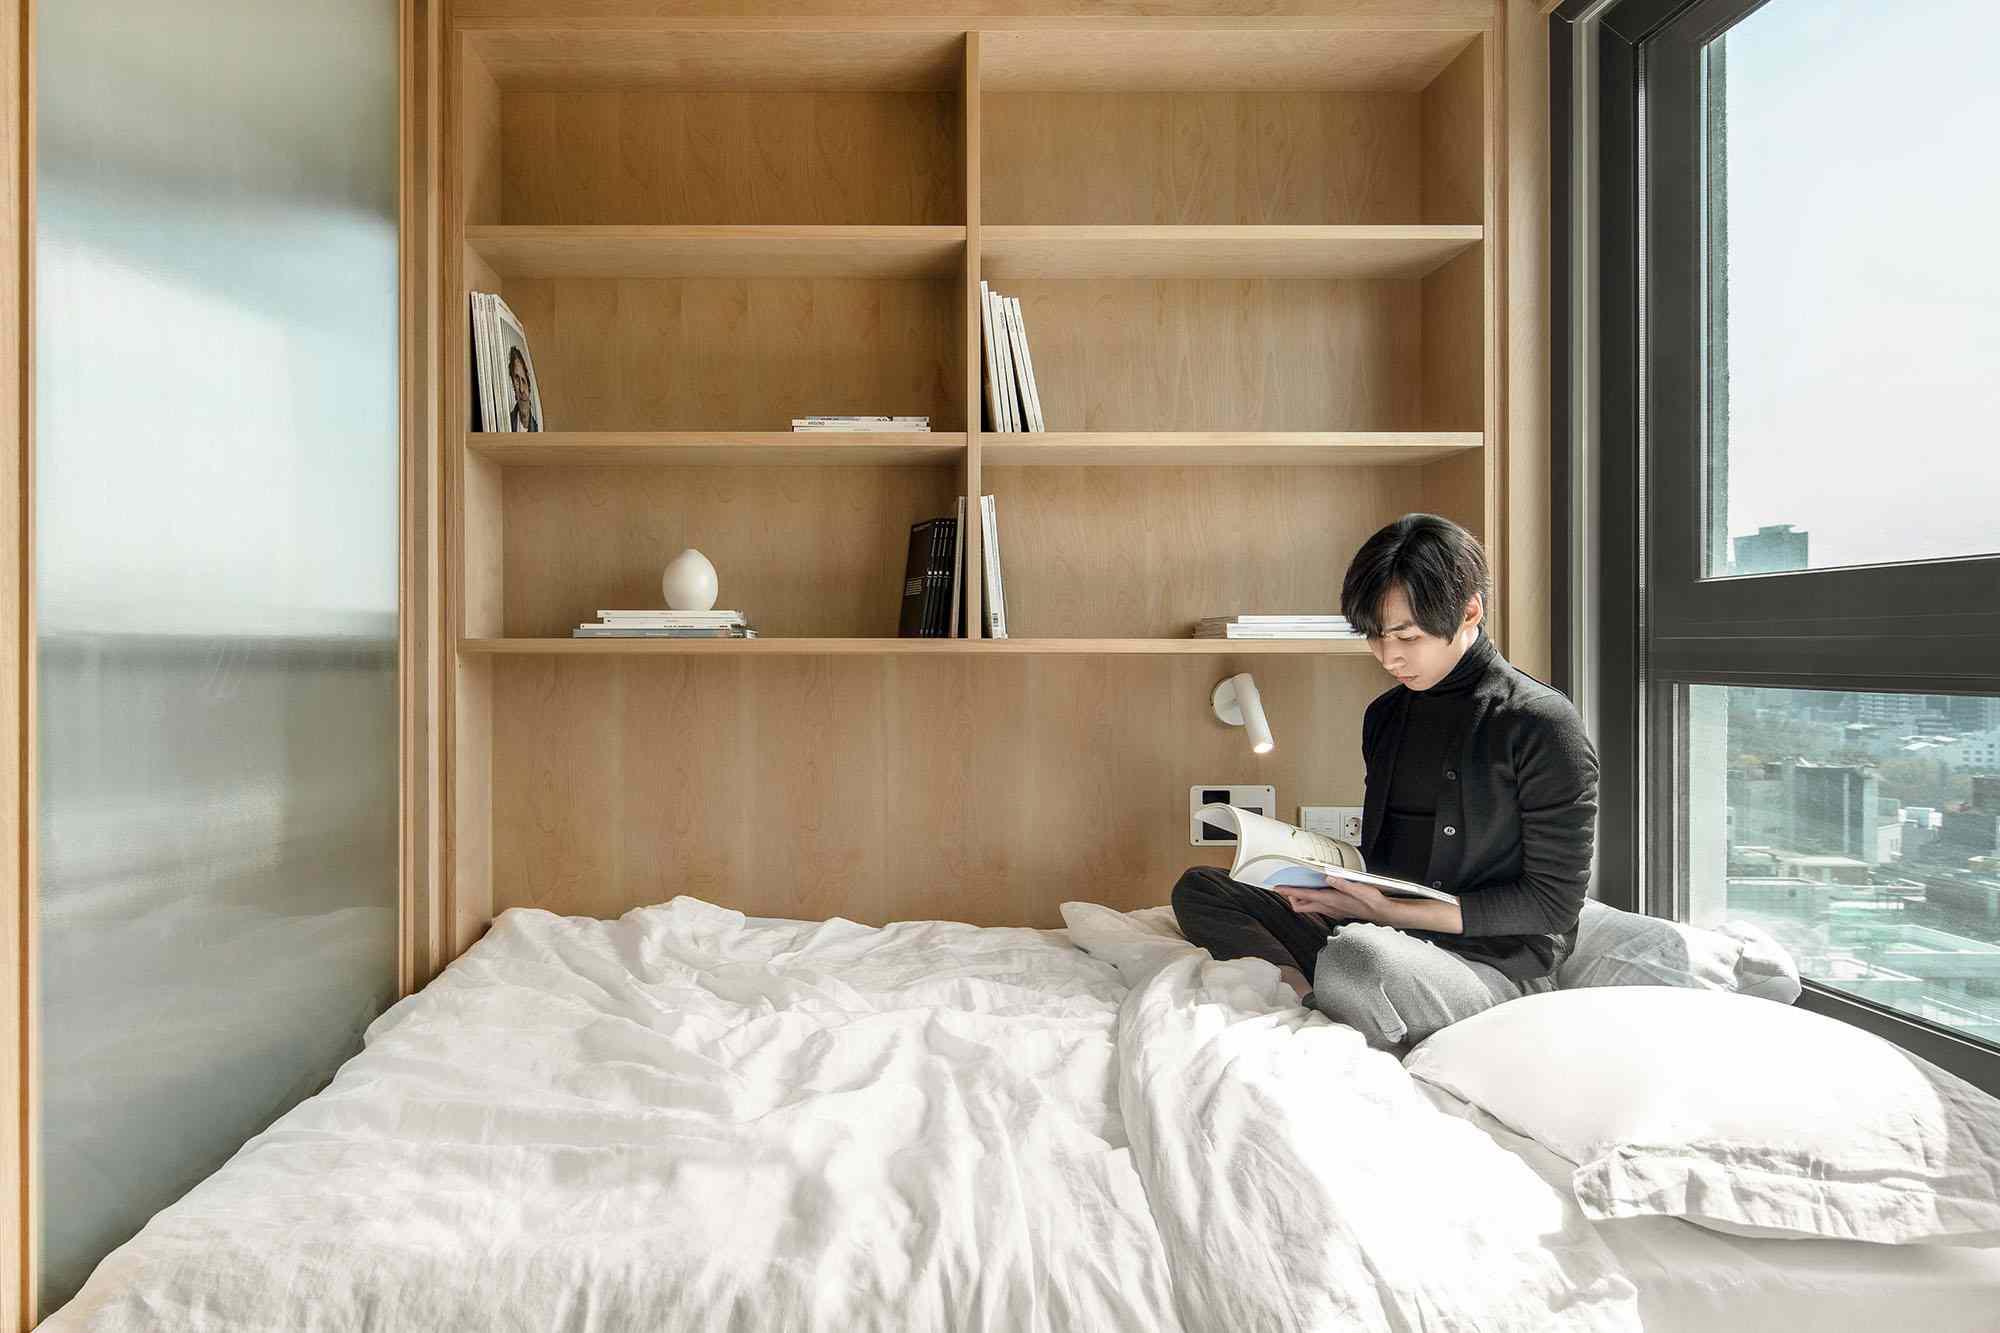 LIFE micro-apartments coliving Ian Lee bedroom